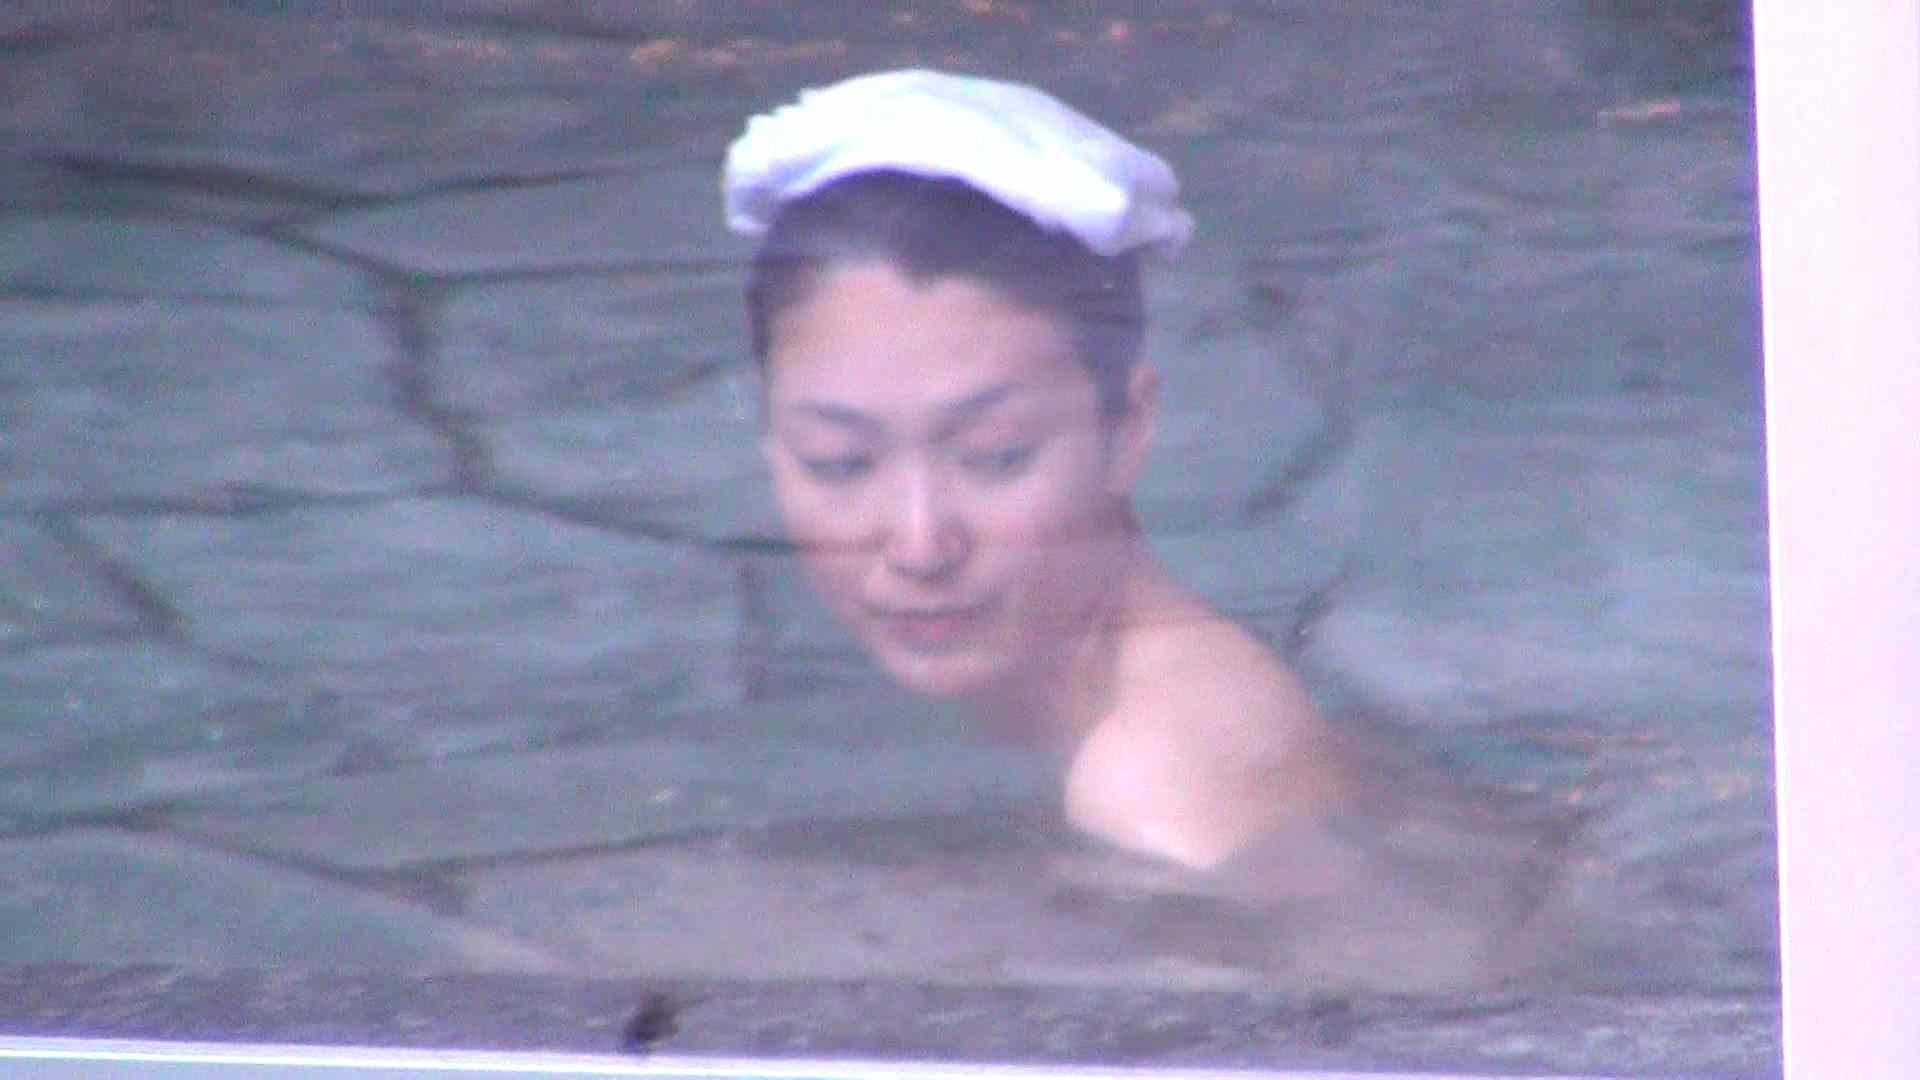 Aquaな露天風呂Vol.290 OL  109連発 34